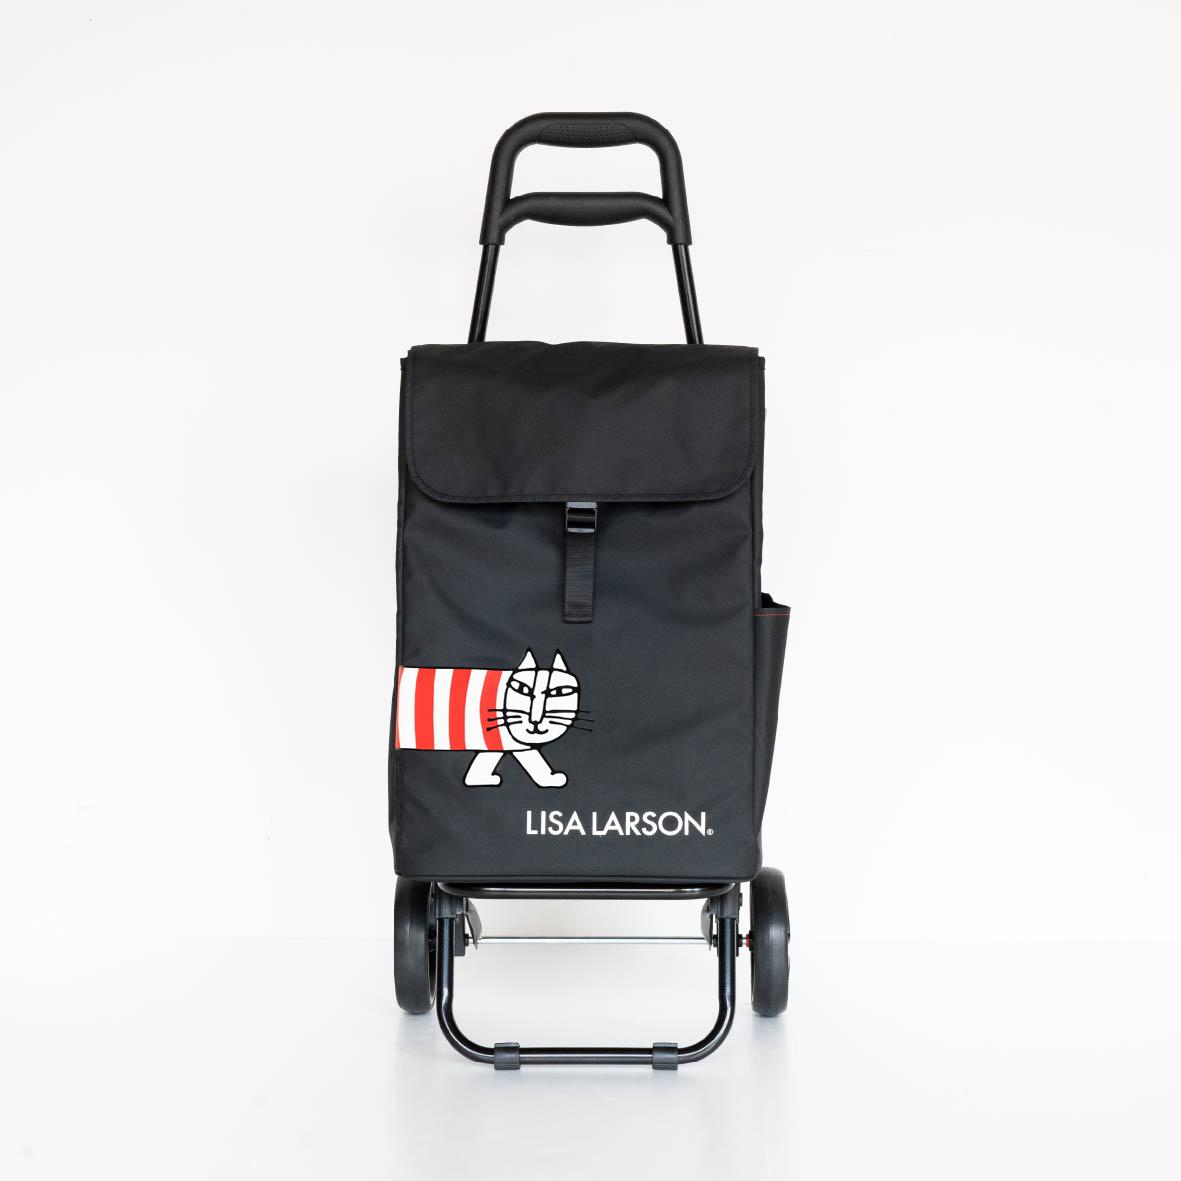 (Y)【2021年7月上旬以降順次出荷予定】保温・保冷ショッピングカート(マイキー ・ブラック)